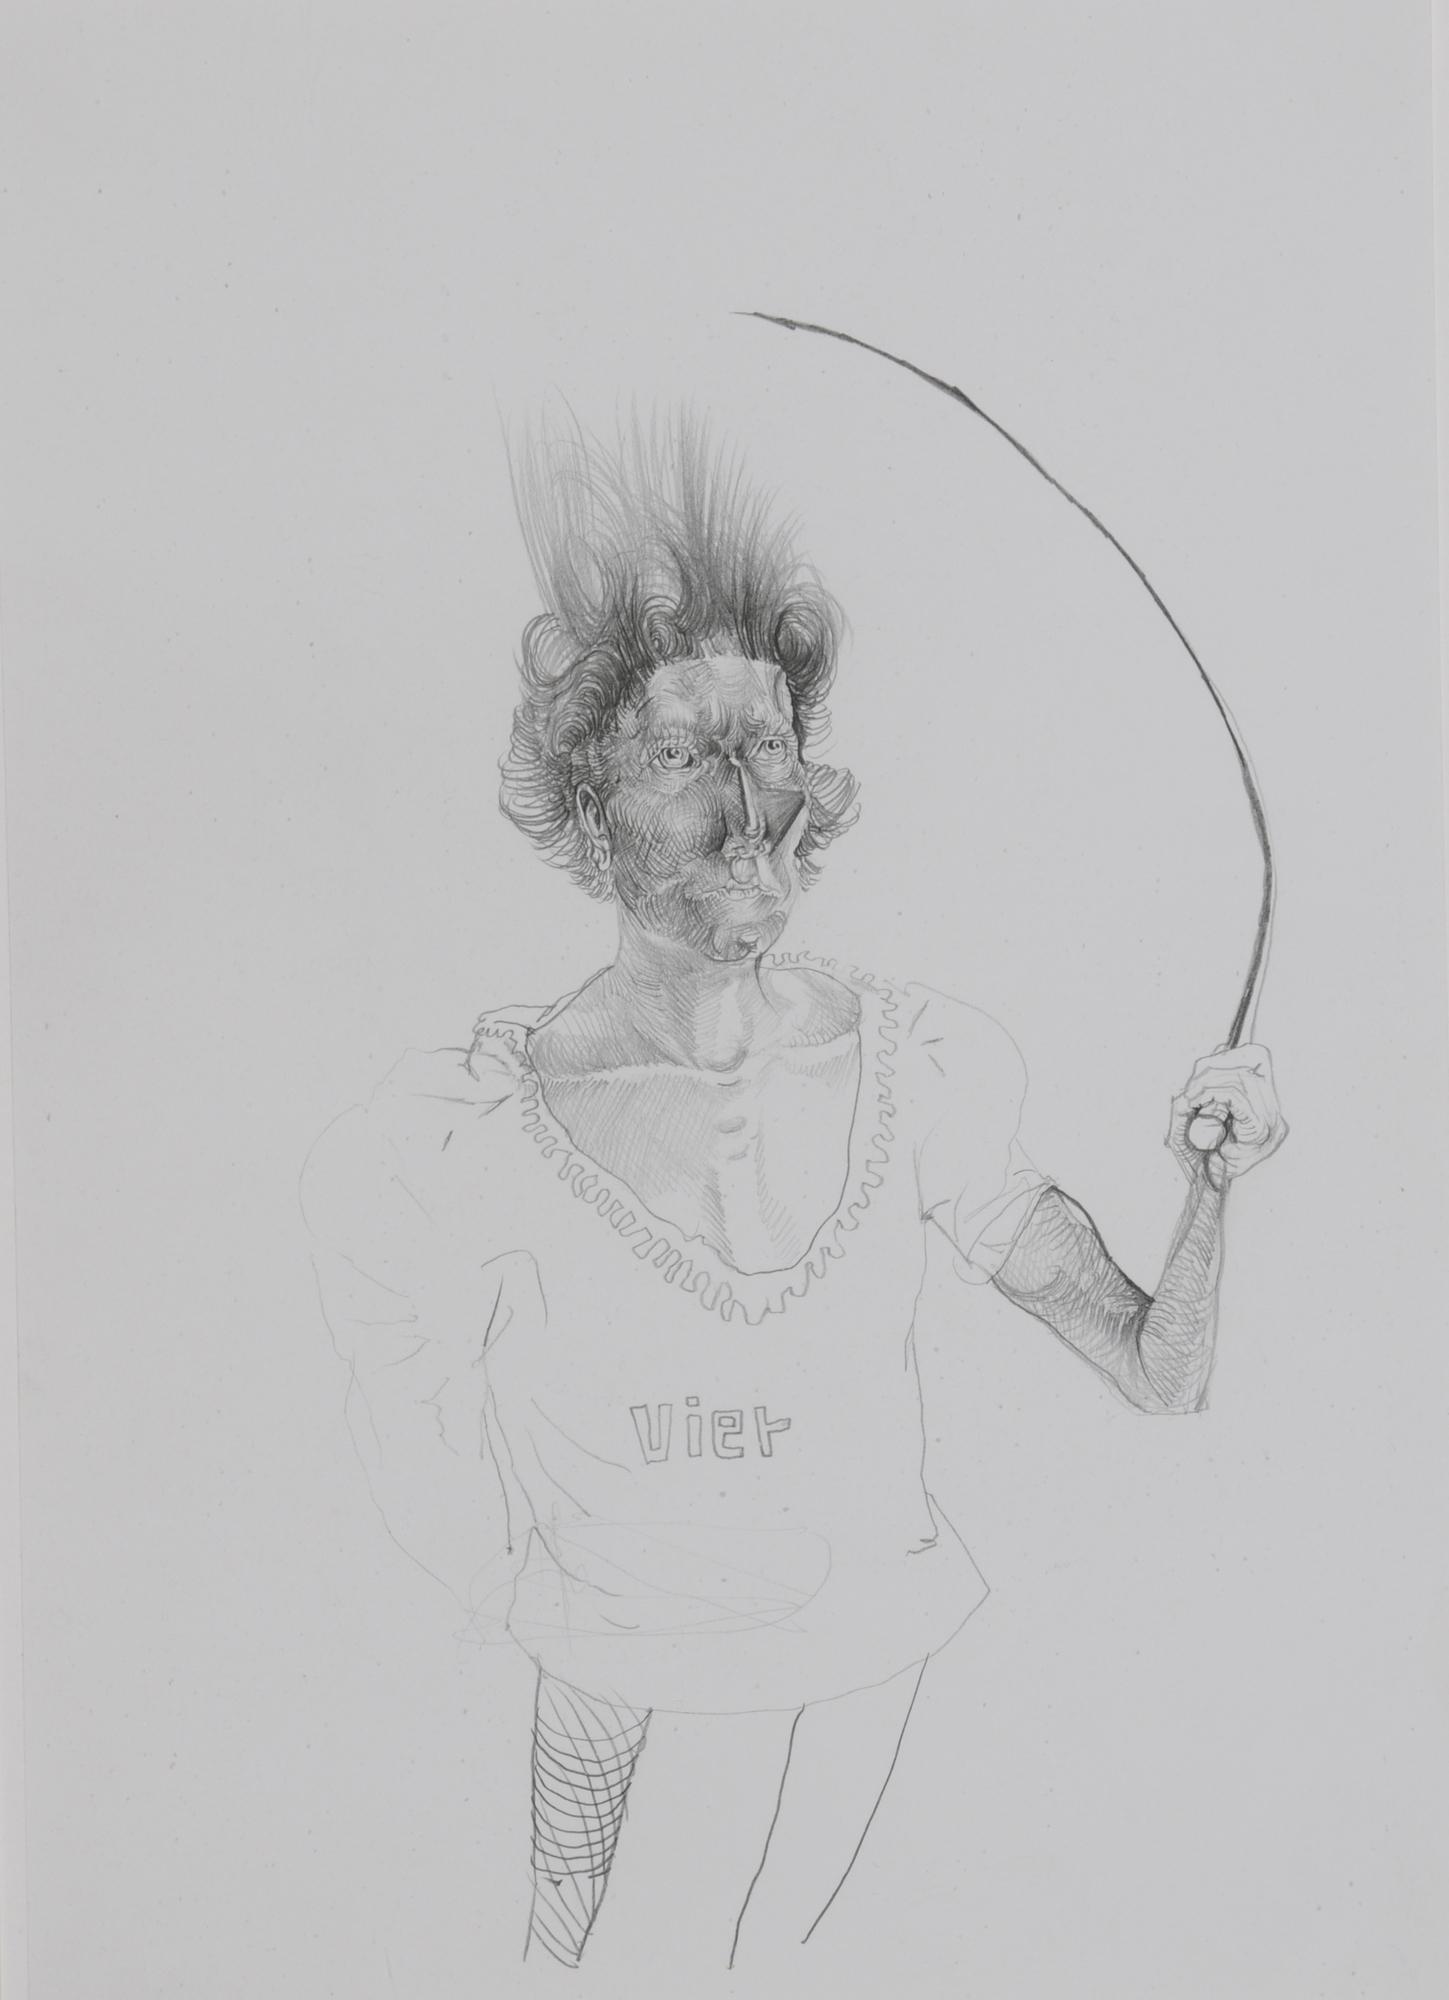 Feiler Peter, 2 drawings: Domina, 2004; Untitled, 2004.